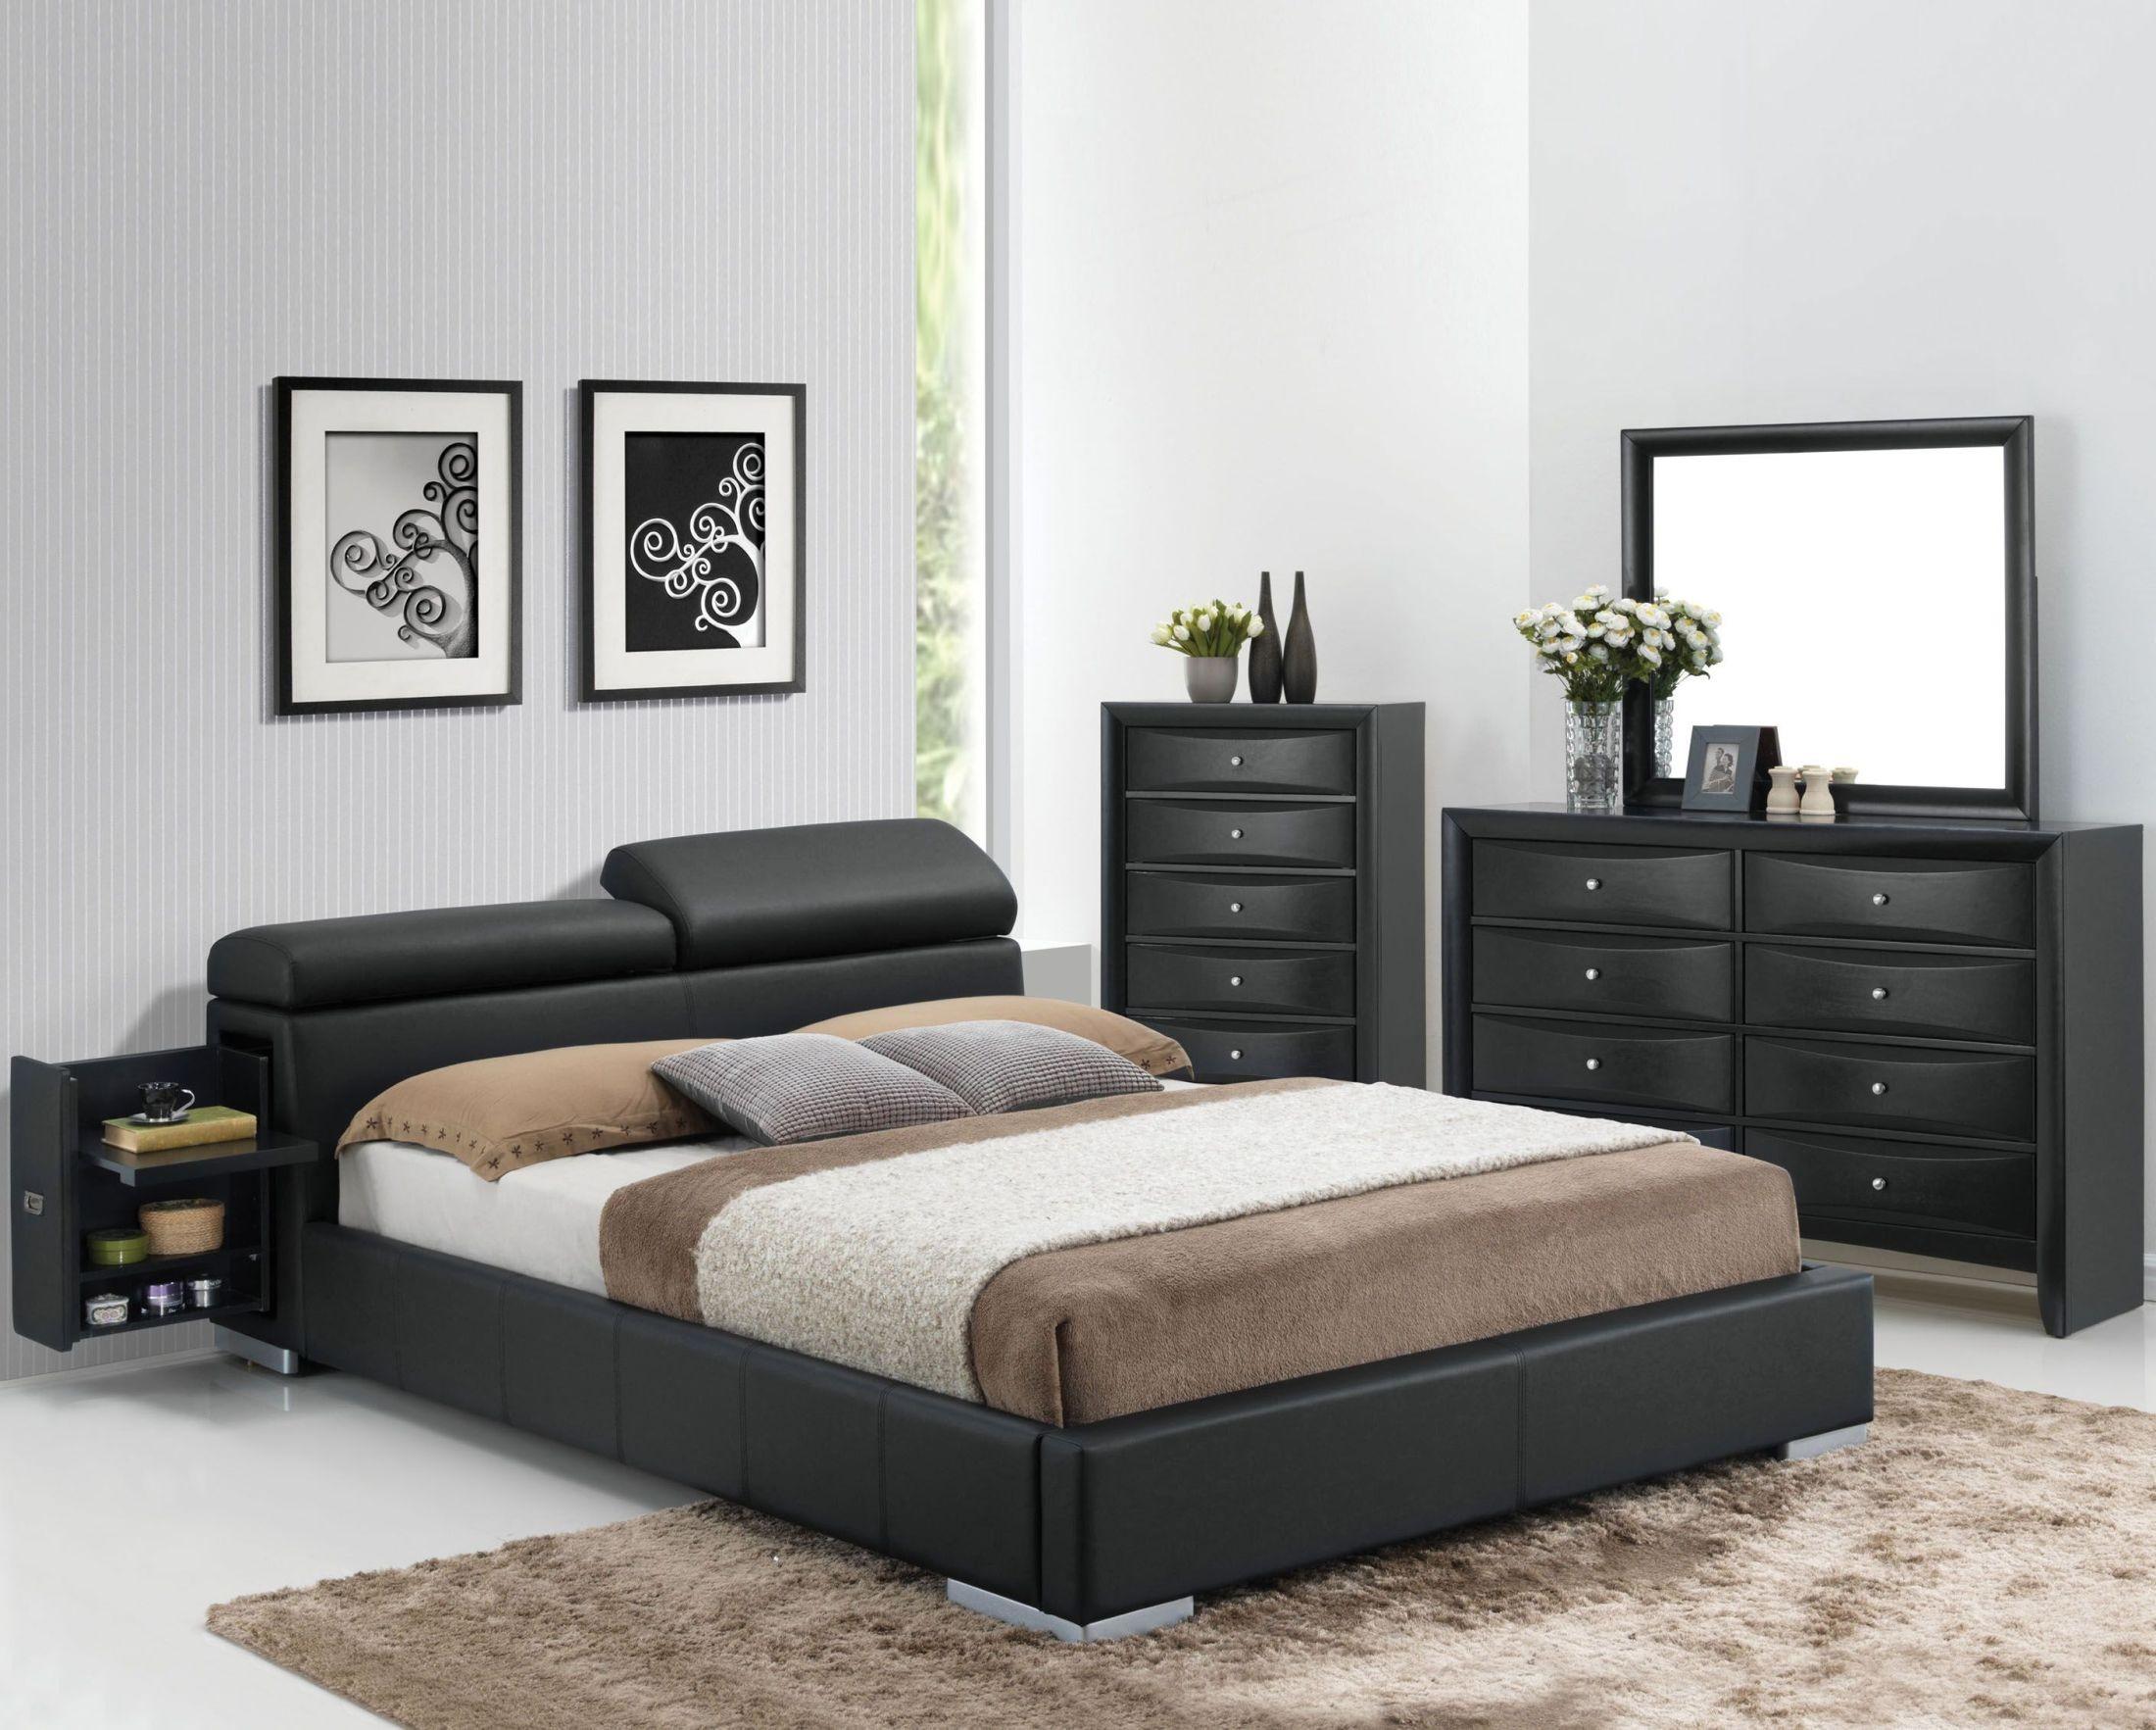 Manjot Black Queen Hidden Storage Platform Bed